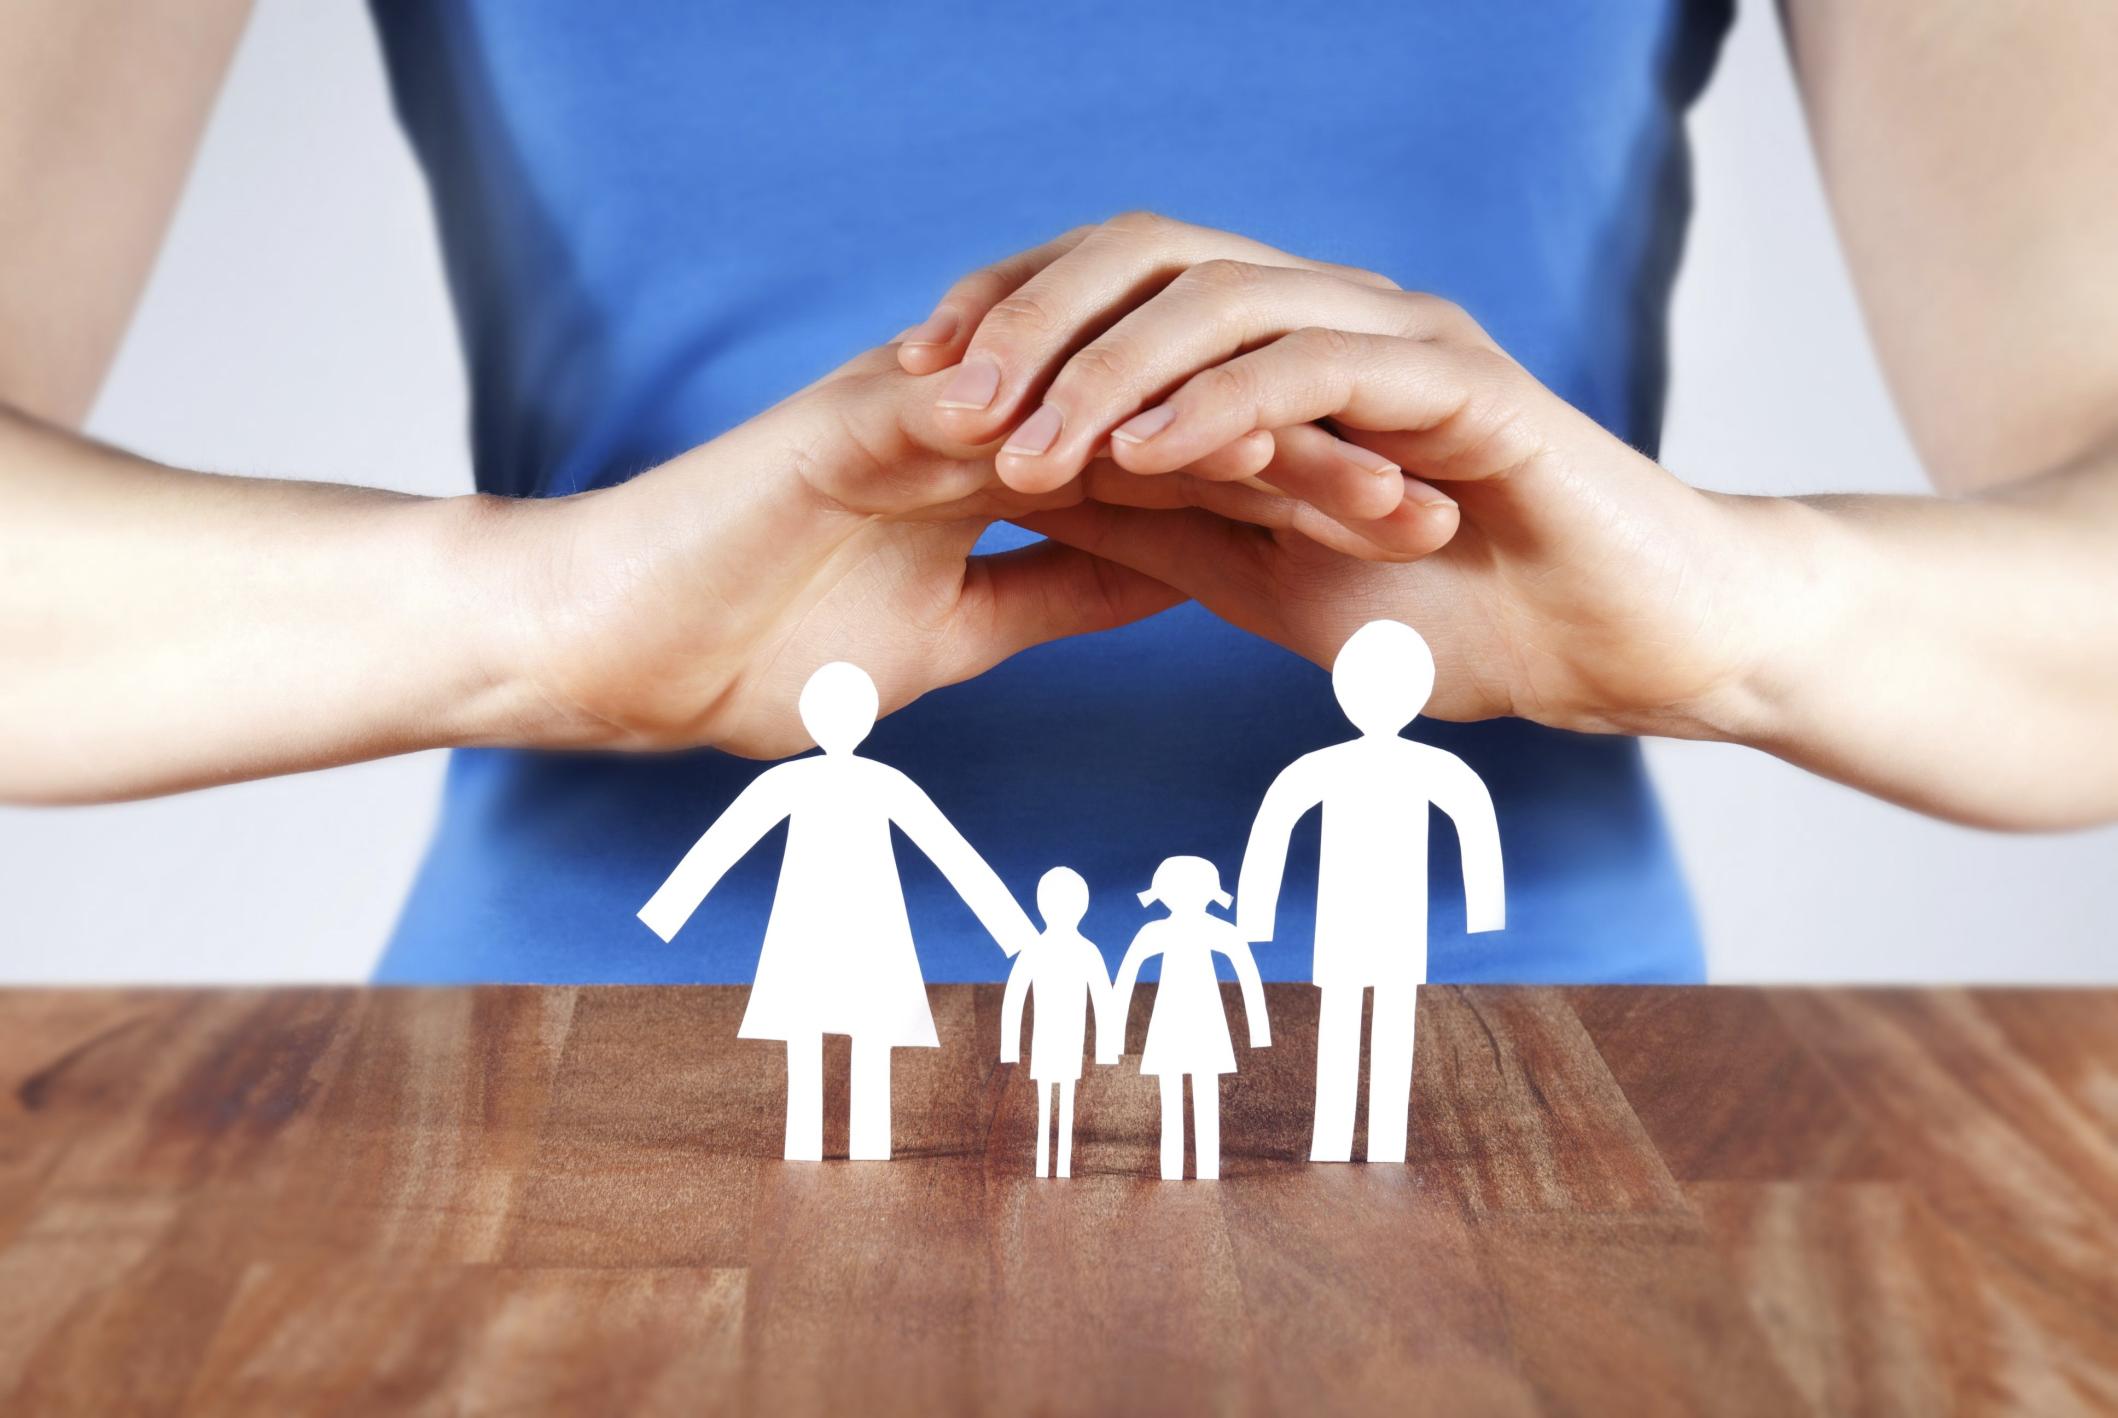 Гигантомания(?), или Слияние компаний «Ренессанс страхование» и «Благосостояние»